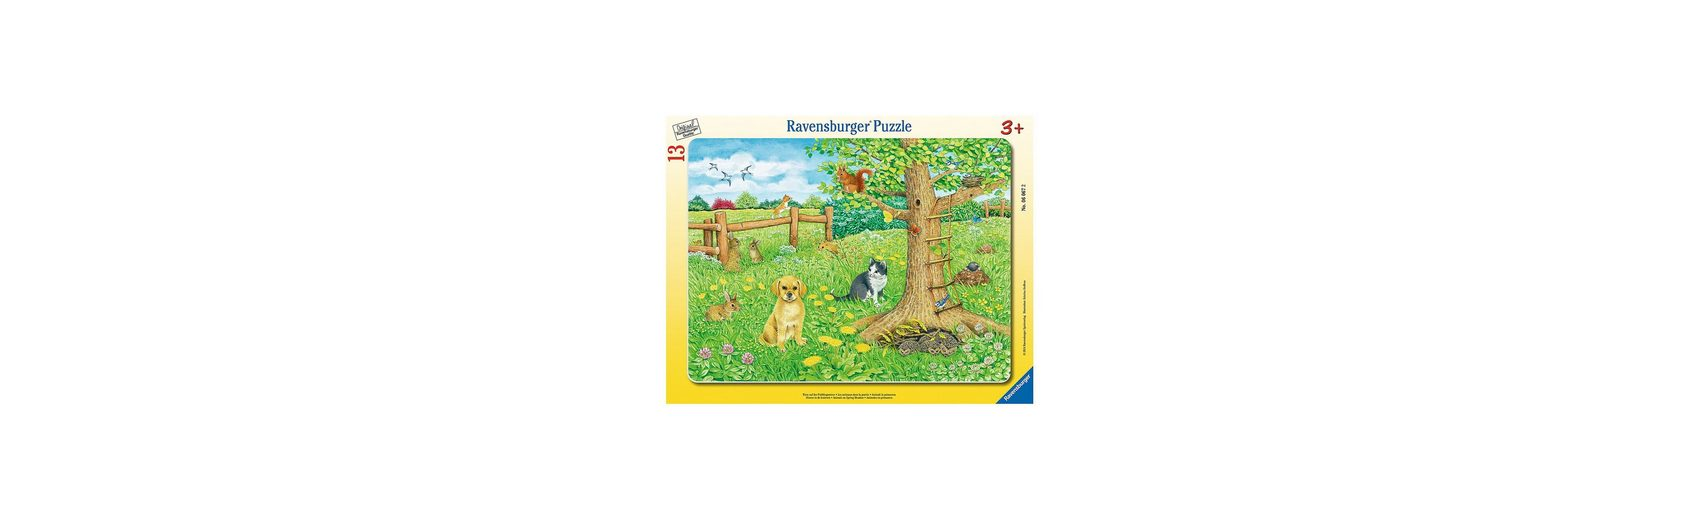 Ravensburger Rahmenpuzzle Tiere auf der Frühlingswiese 13 Teile